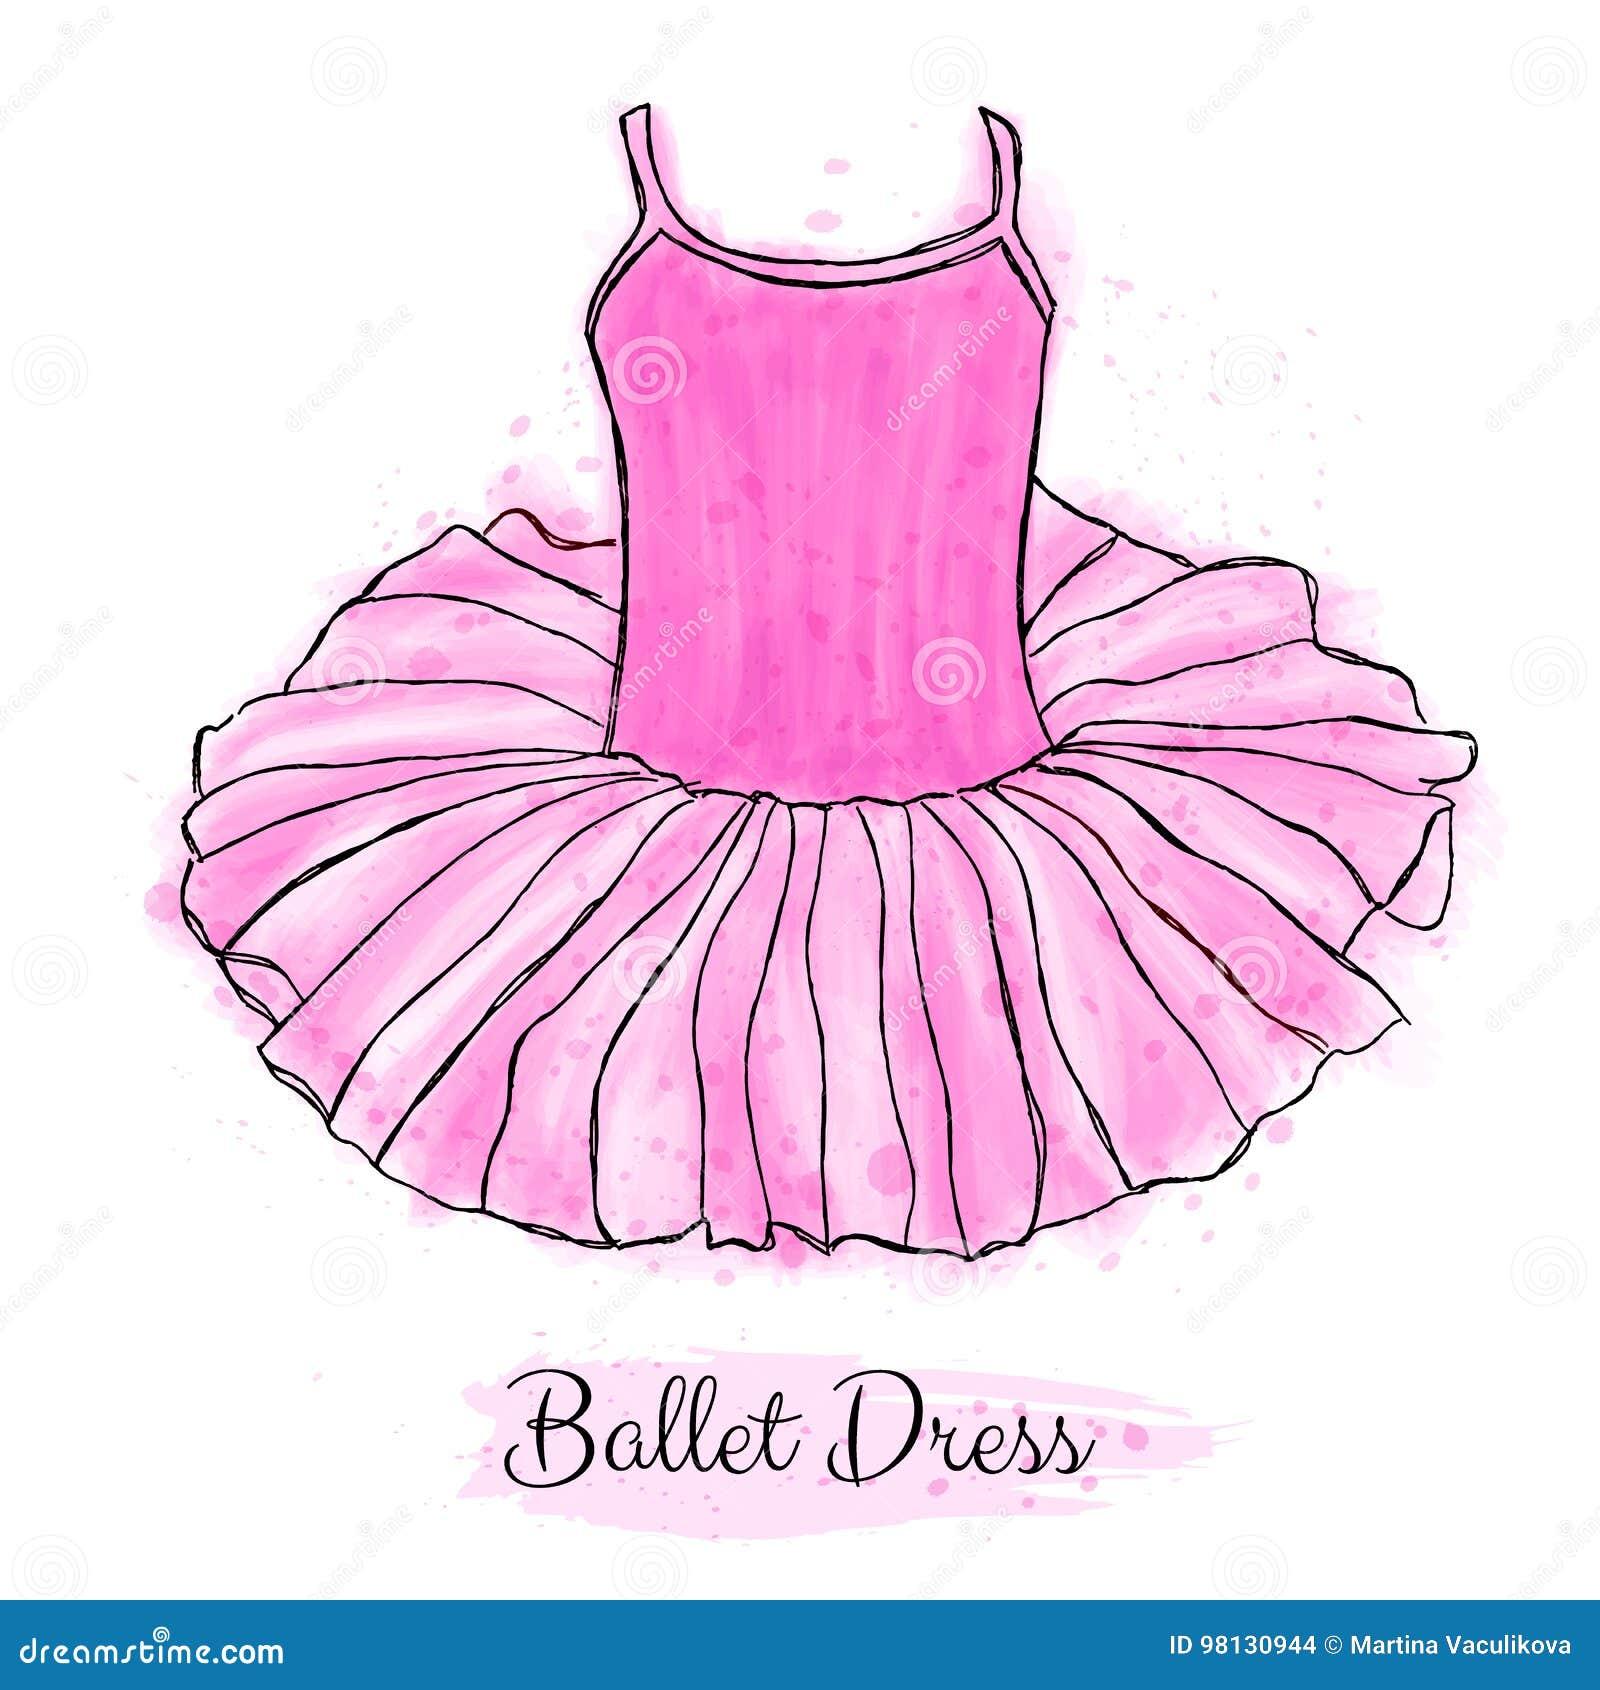 4c2933a9051 Ρόδινο φόρεμα Ballerina Tutu Κλασικό φόρεμα χορού μπαλέτου απόδοσης Συρμένη  χέρι εργασία τέχνης που απομονώνεται στο άσπρο υπόβαθρο